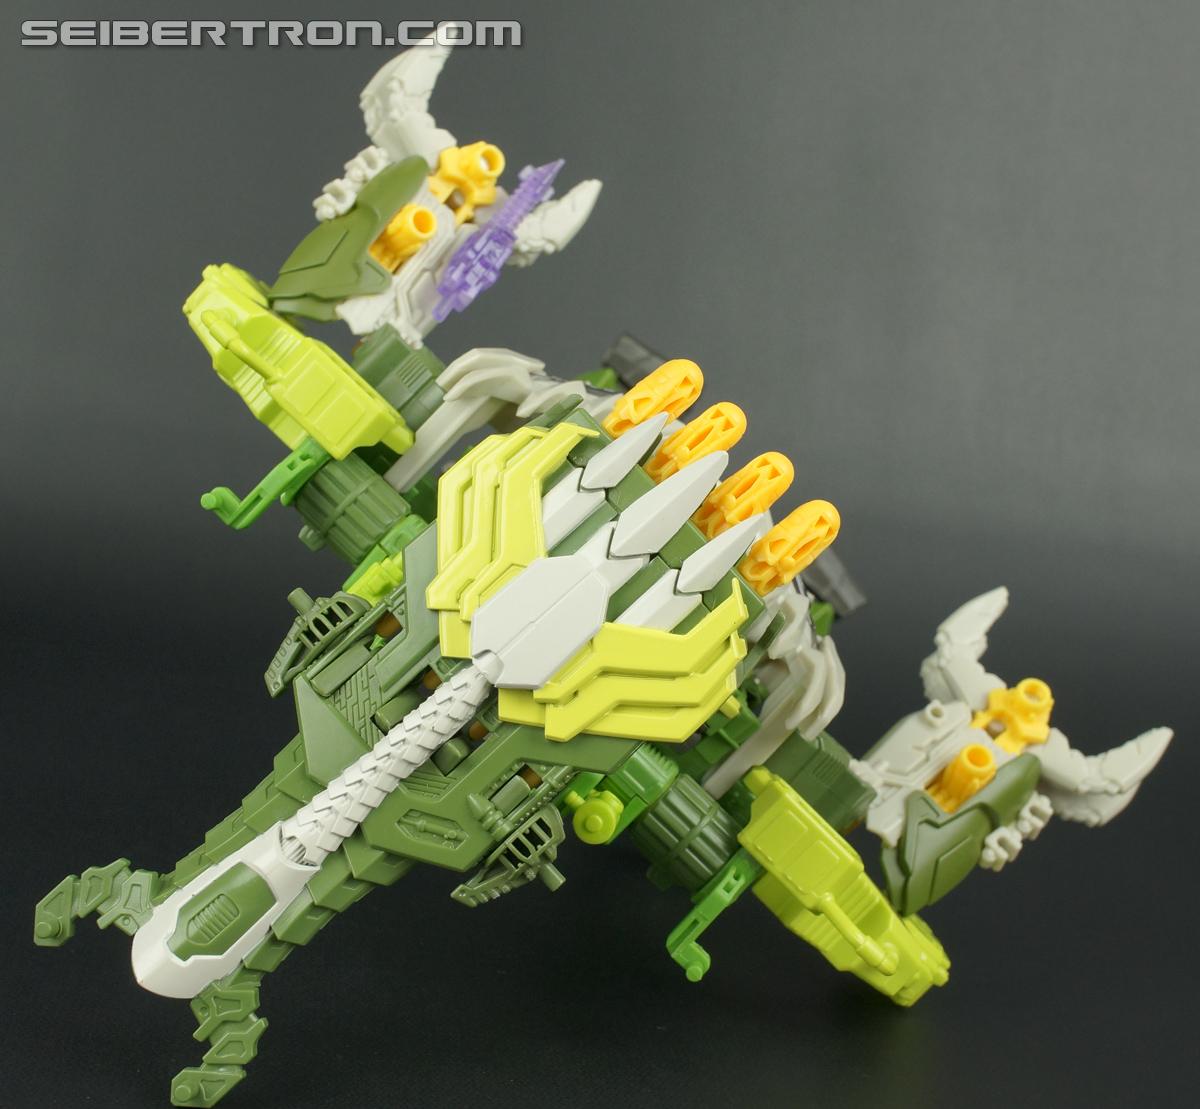 Transformers Prime Beast Hunters Cyberverse Apex Hunter Armor (Image #77 of 96)